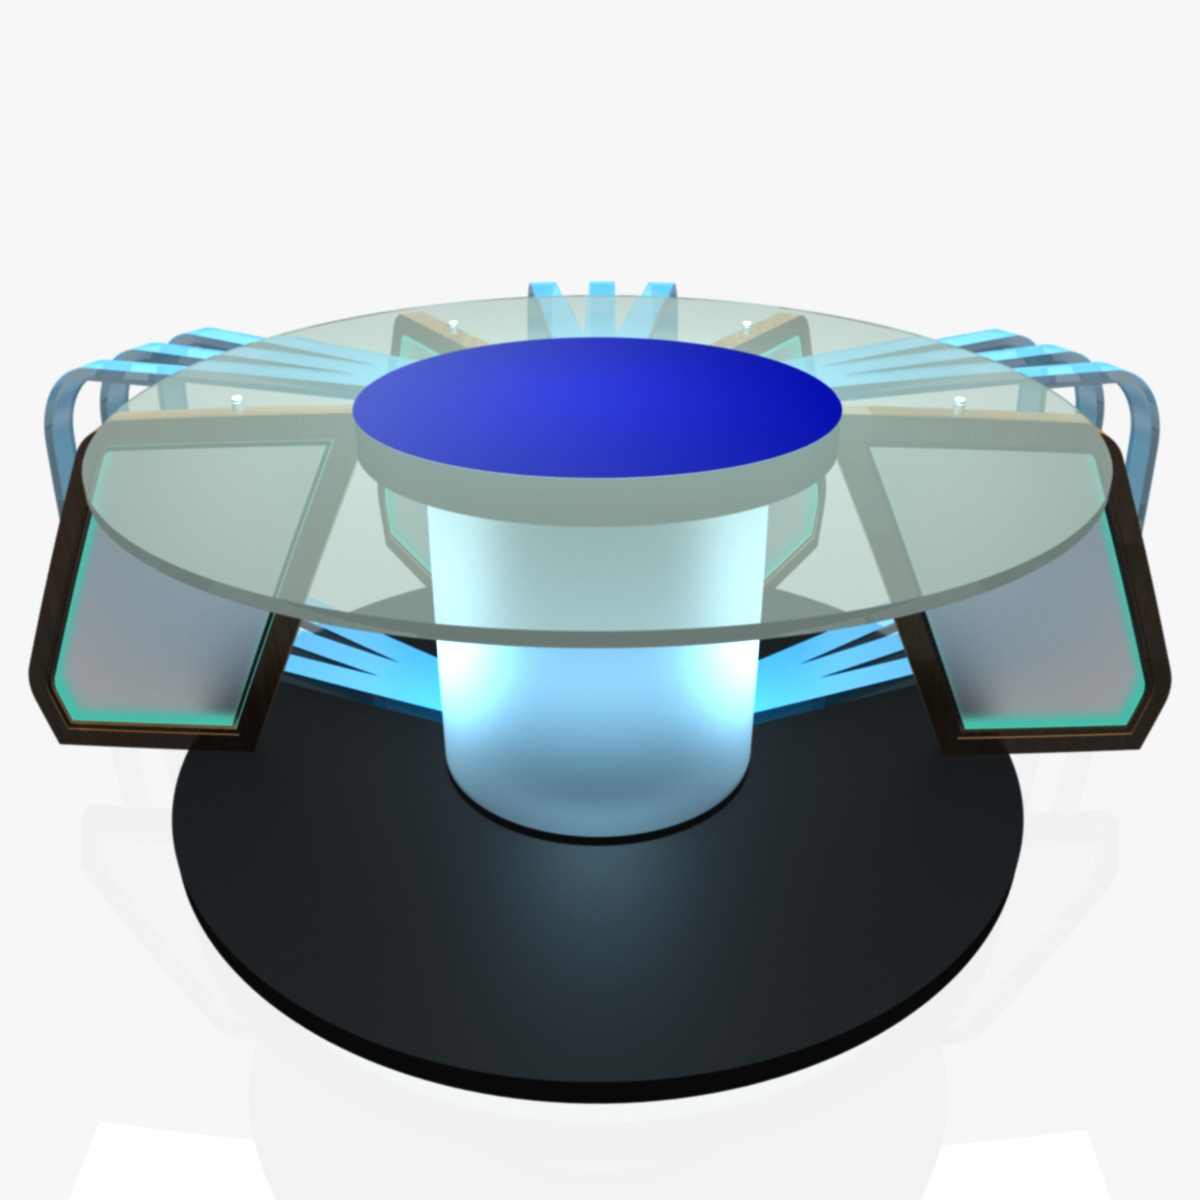 Virtual Tv Studio News Desk 7 3d Model Furniture 3d Models  # Meuble Tv Nesx